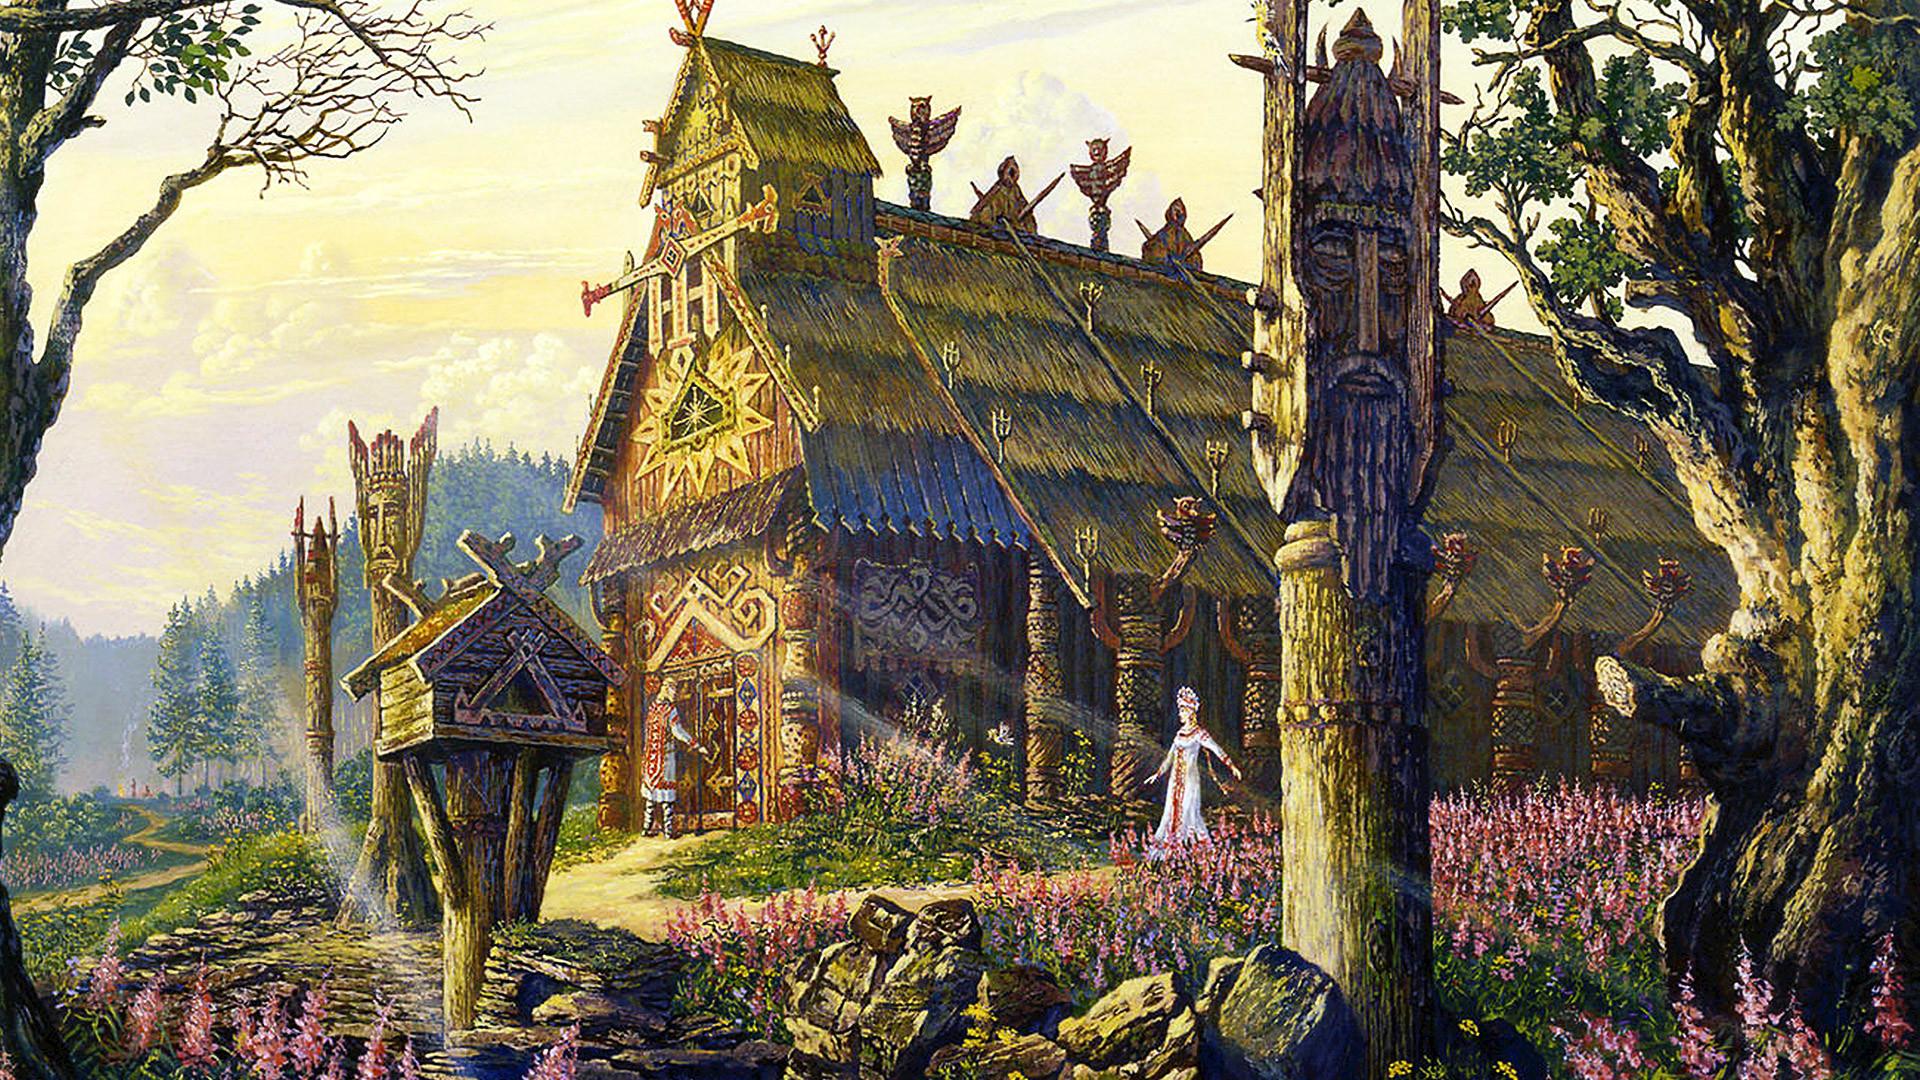 Kuil Dewa Musim Panas Radegast. Lukisan oleh V. B. Ivanov (*1950). Cat minyak pada kanvas.